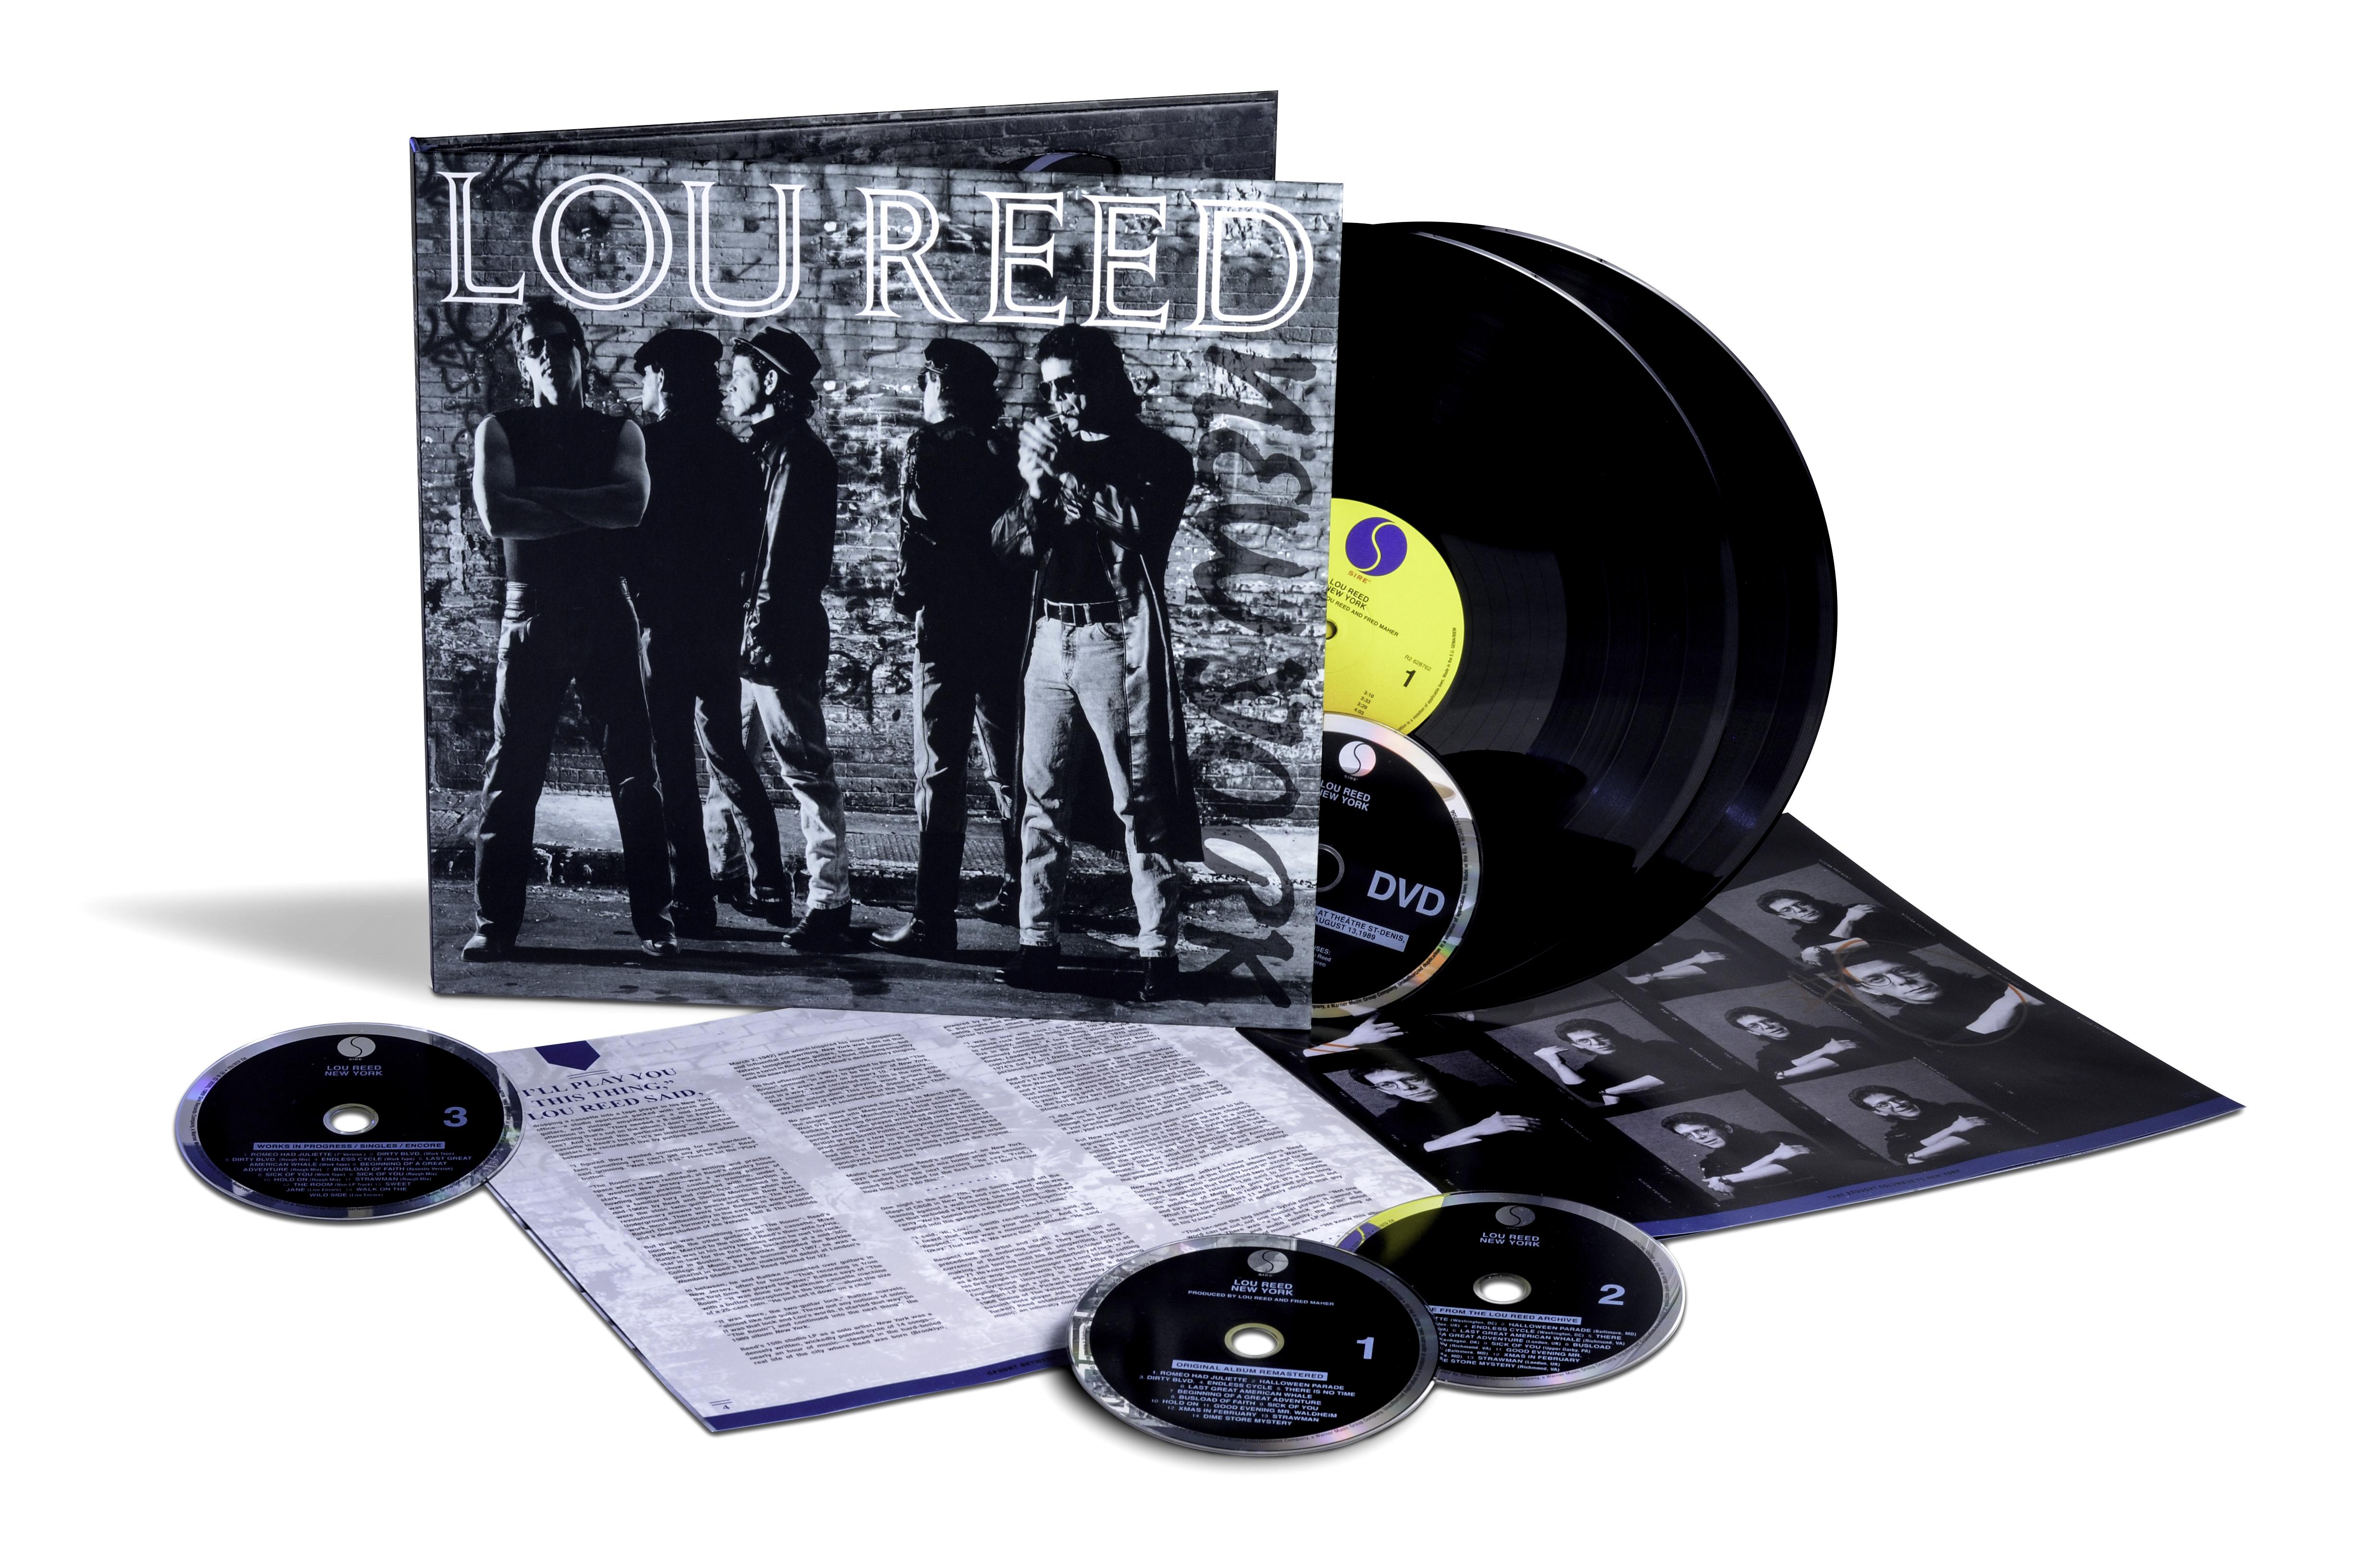 Lou Reed - New York [LTD 2xLP + 3CD + DVD]